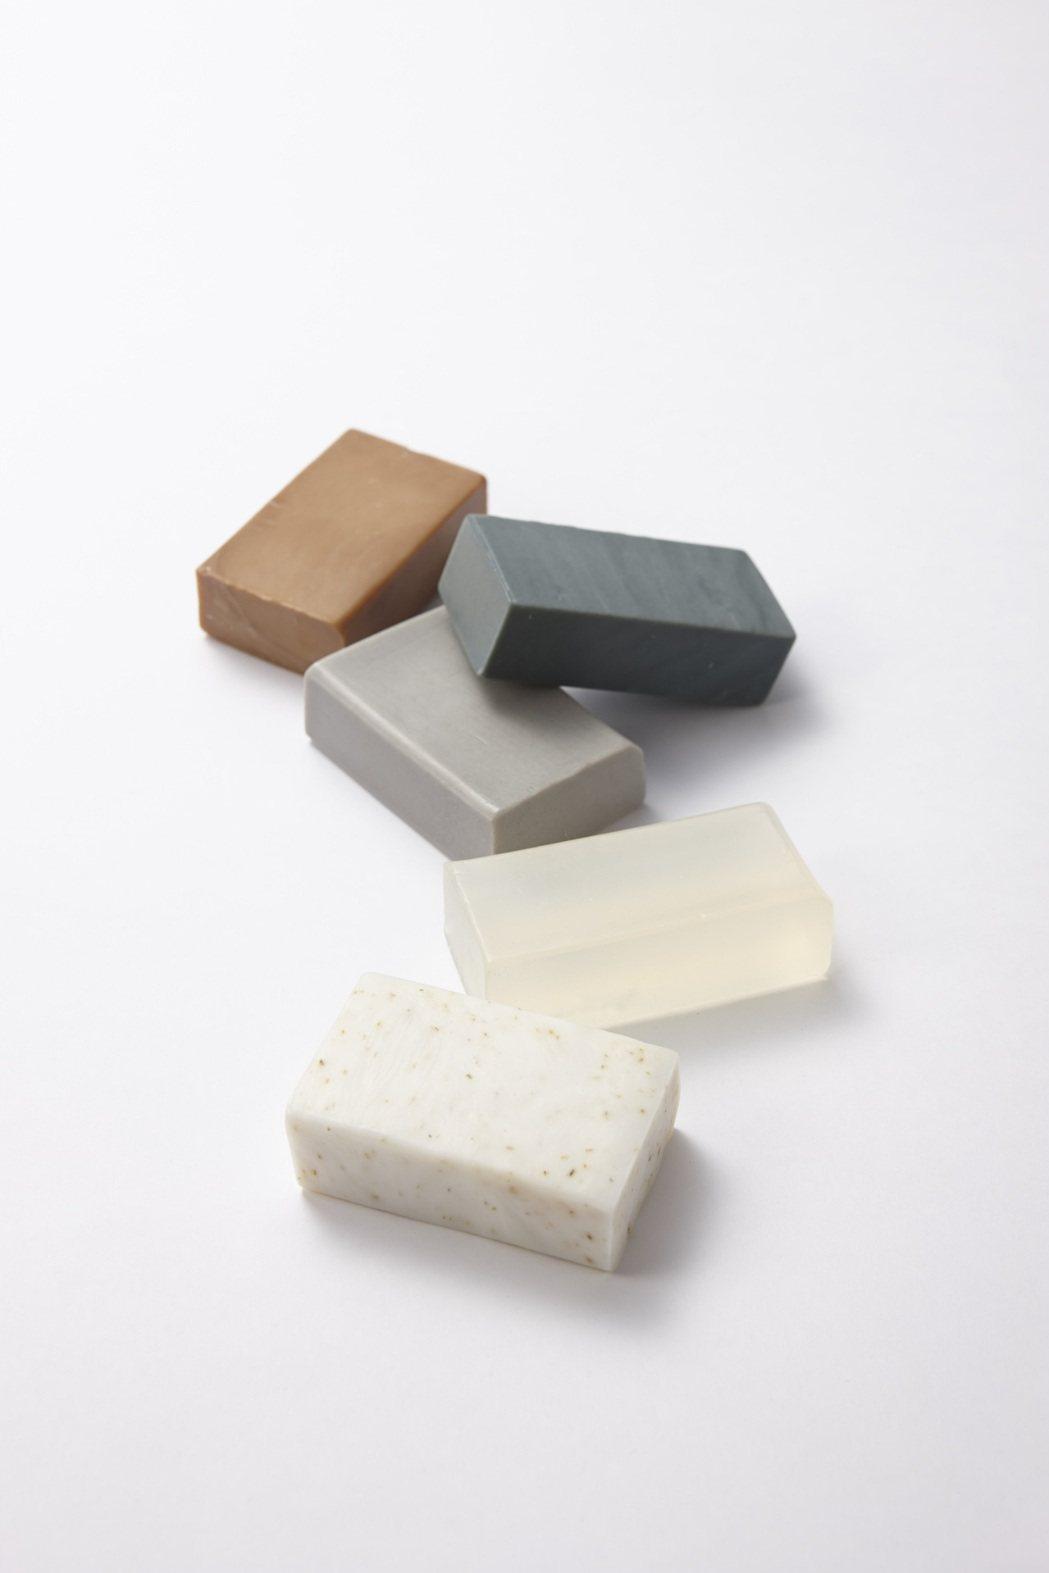 HANDSX松山油脂寵愛自己美皂5件組。圖/台隆手創館提供